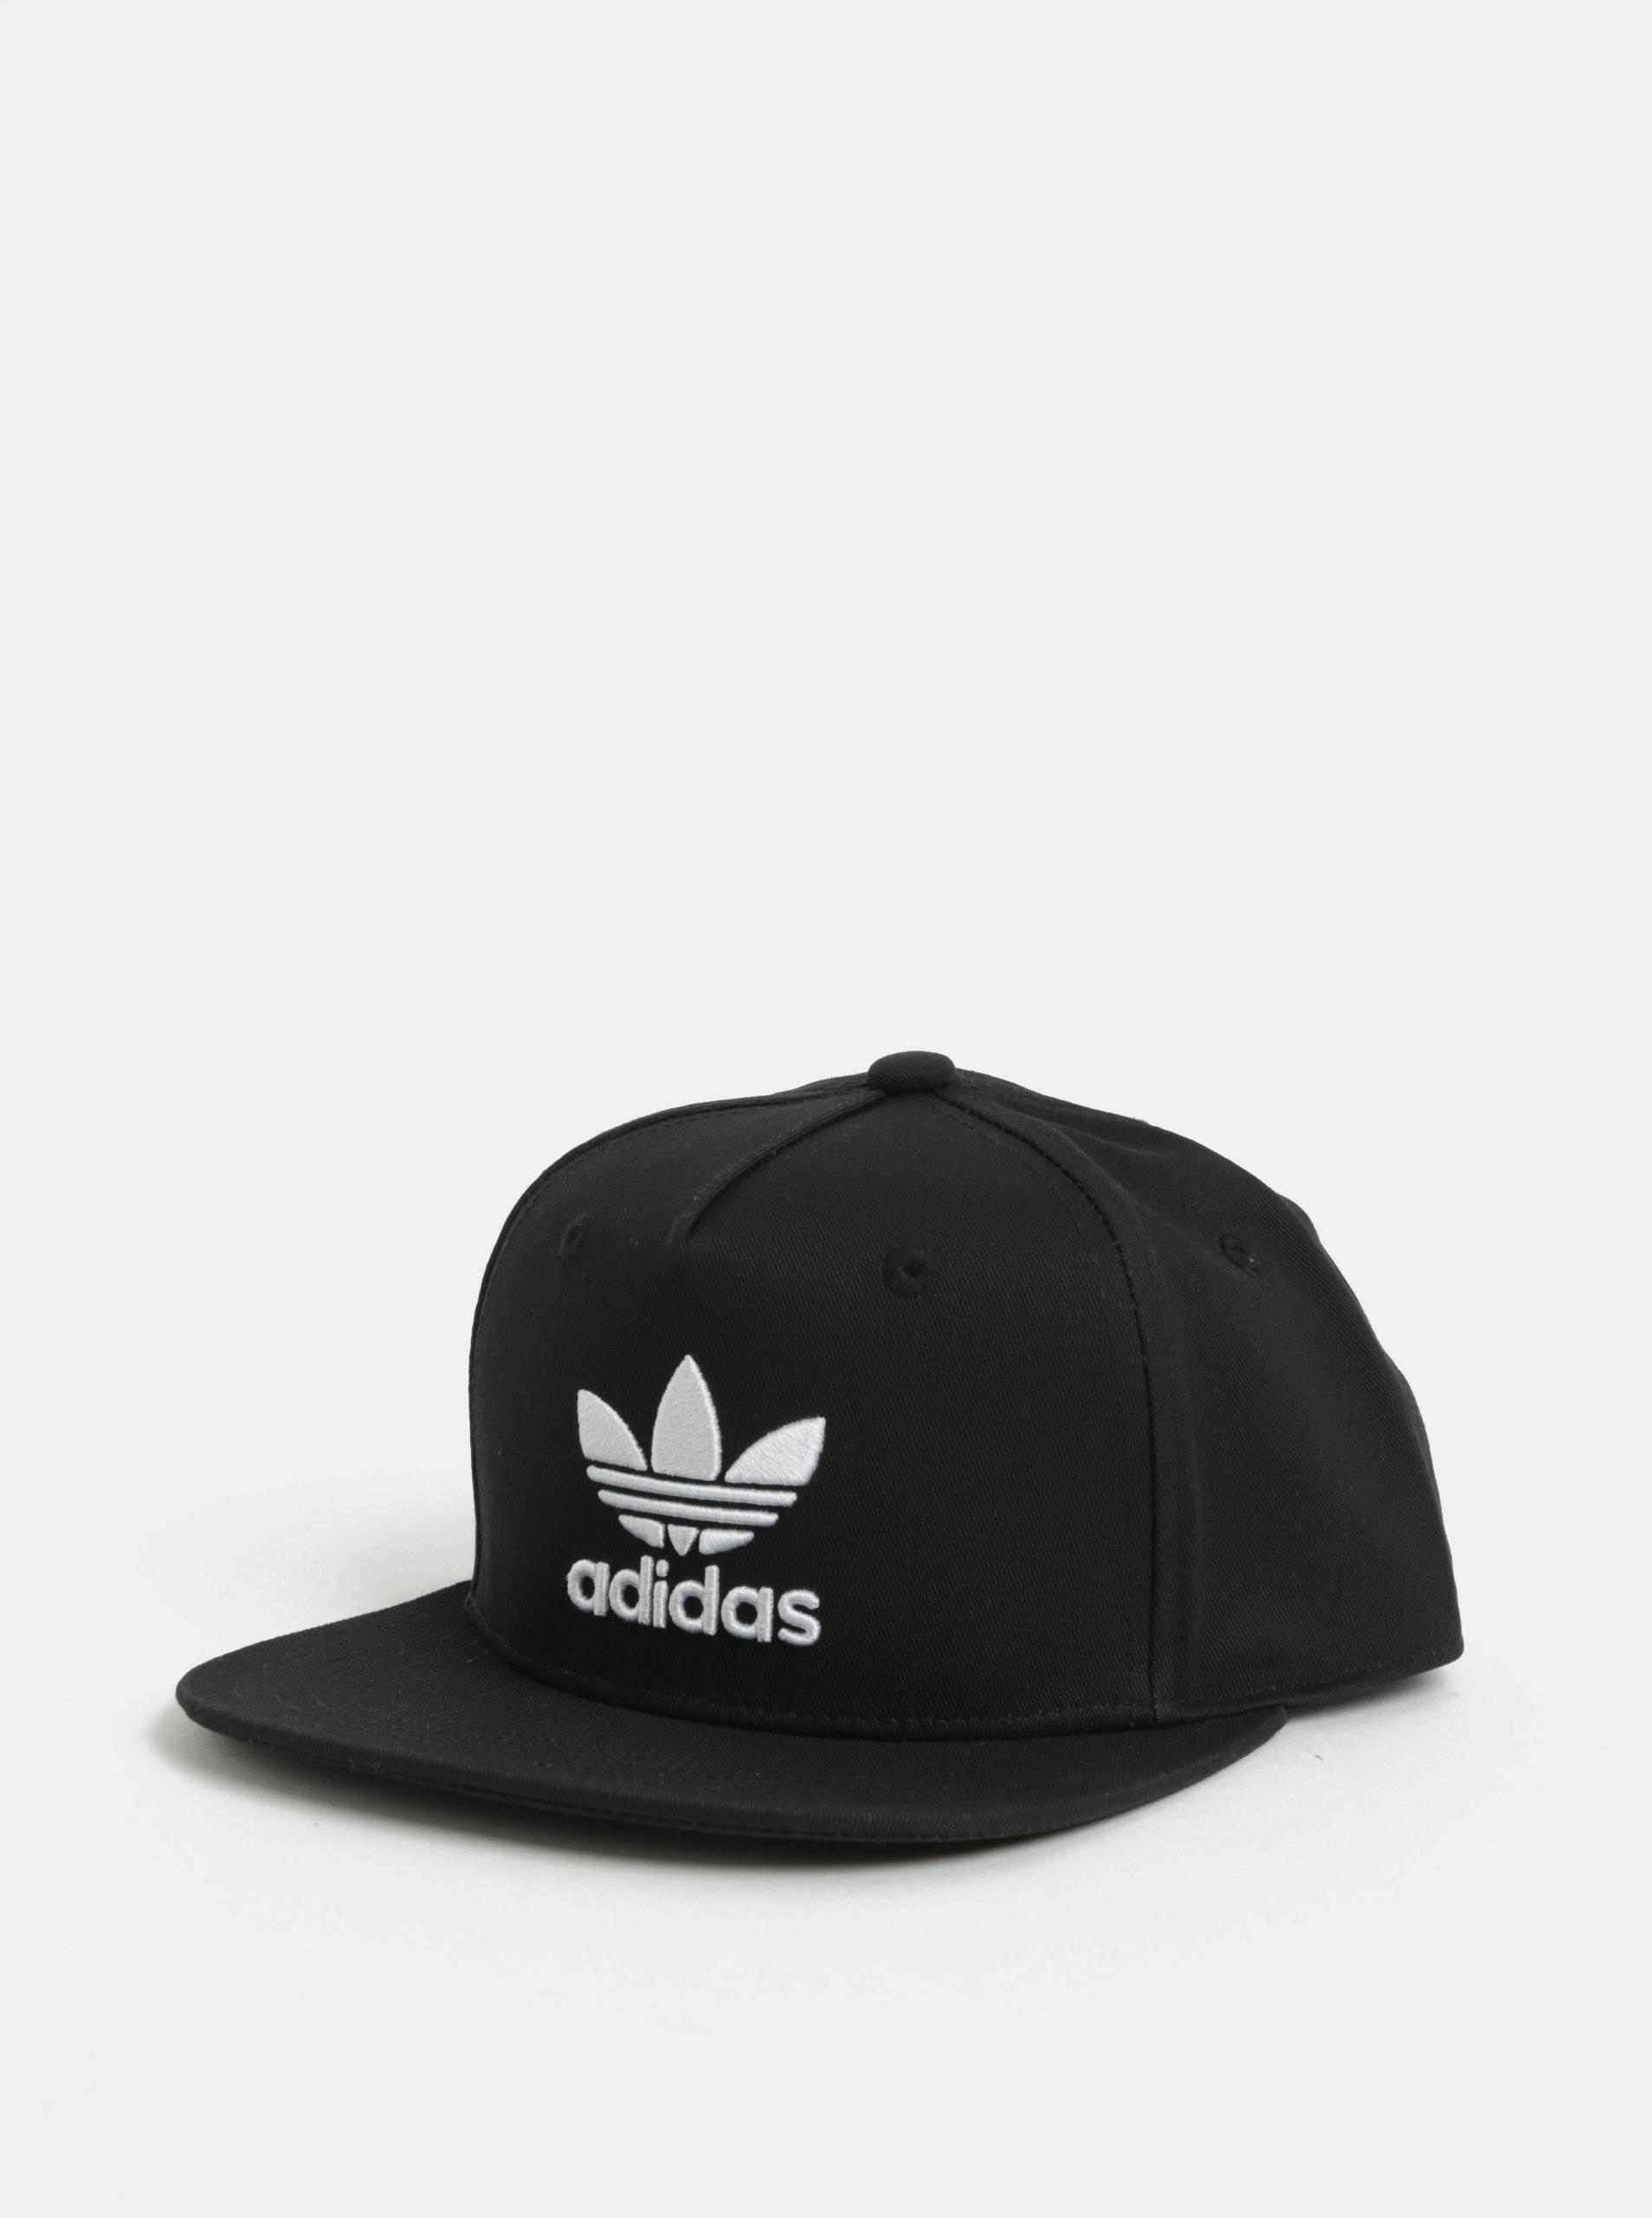 4f1dabb10e9 Černá dětská kšiltovka adidas Originals Trefoil ...